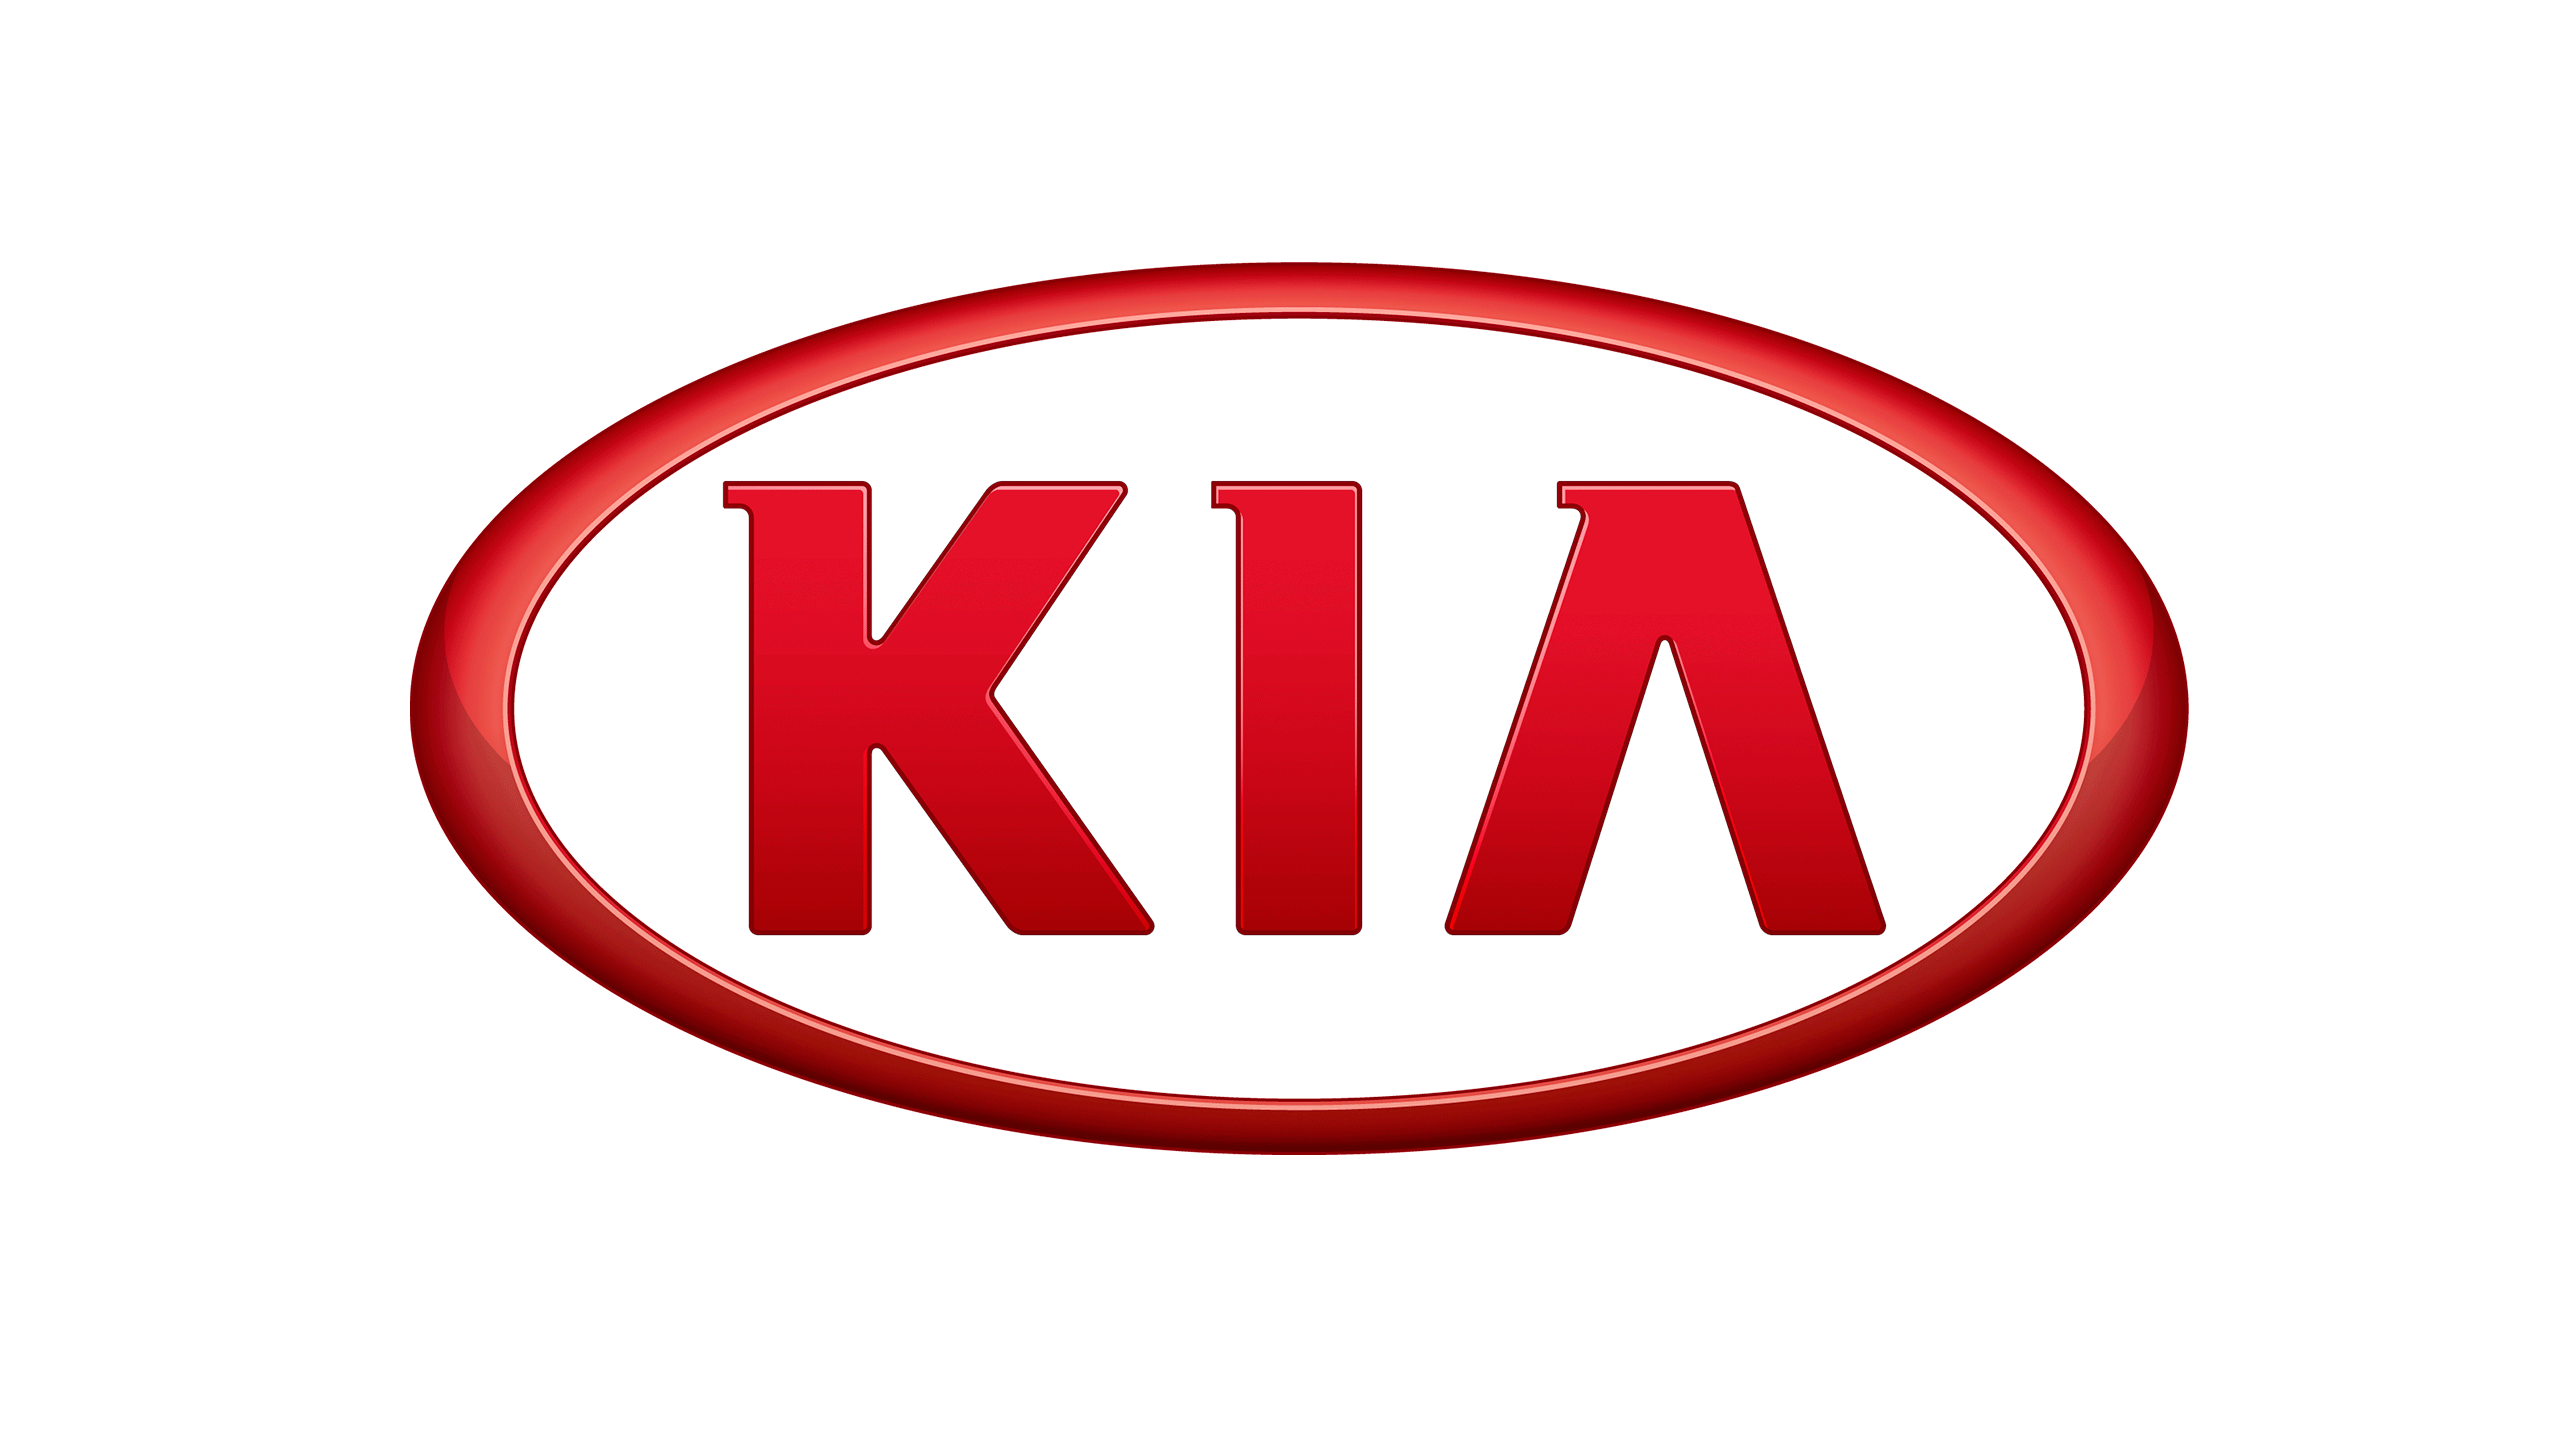 Car Logo Kia - Car Logo PNG